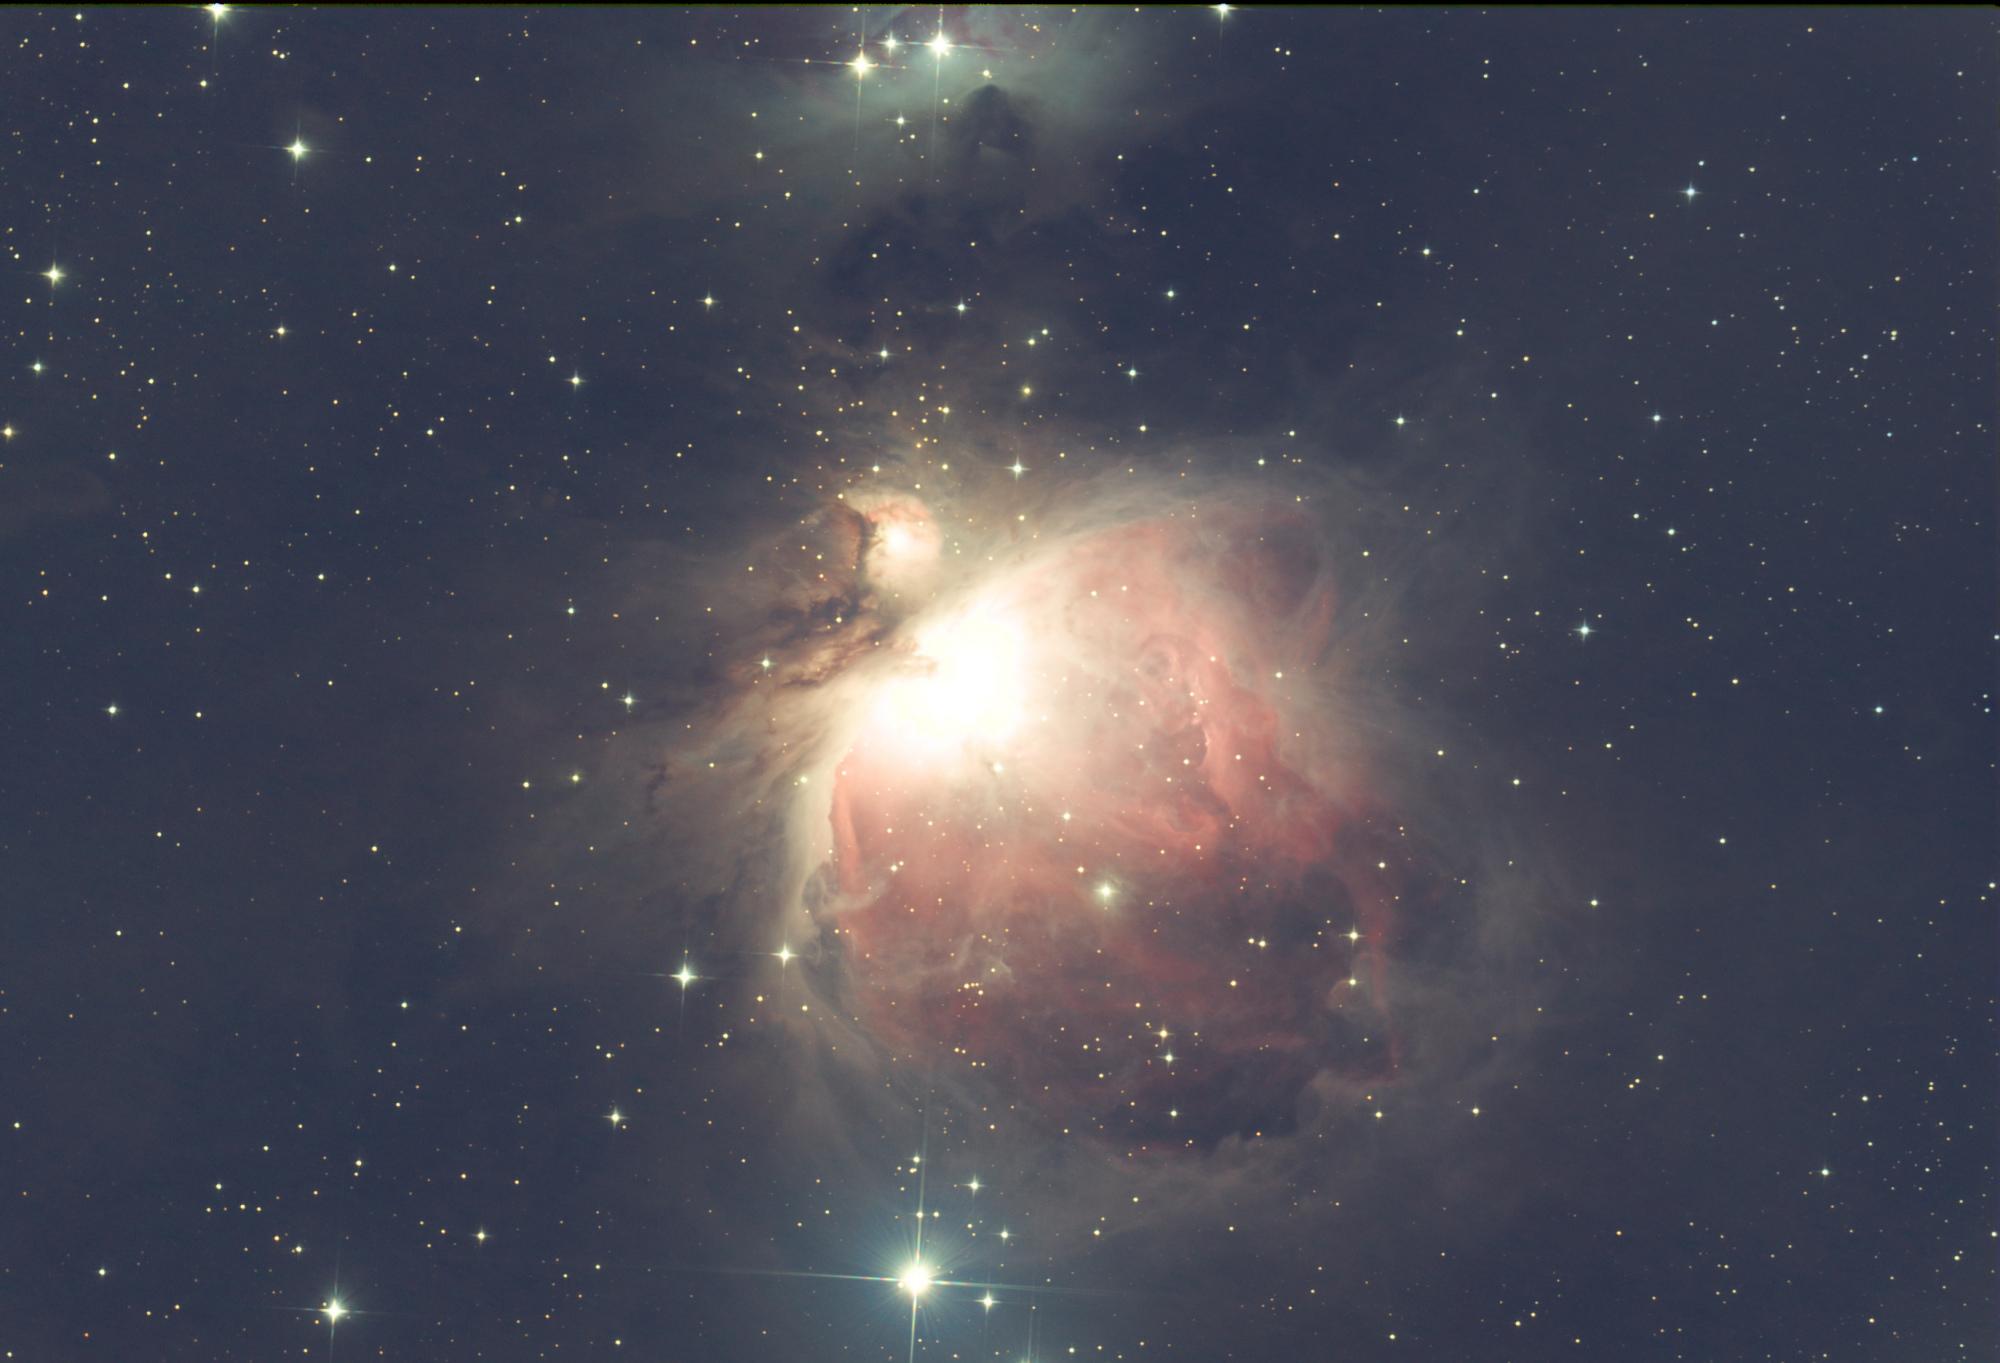 M42-N200F3.8-01-21-45mn.thumb.jpg.61866eccac52ab067b0a90e6b57bc8b0.jpg